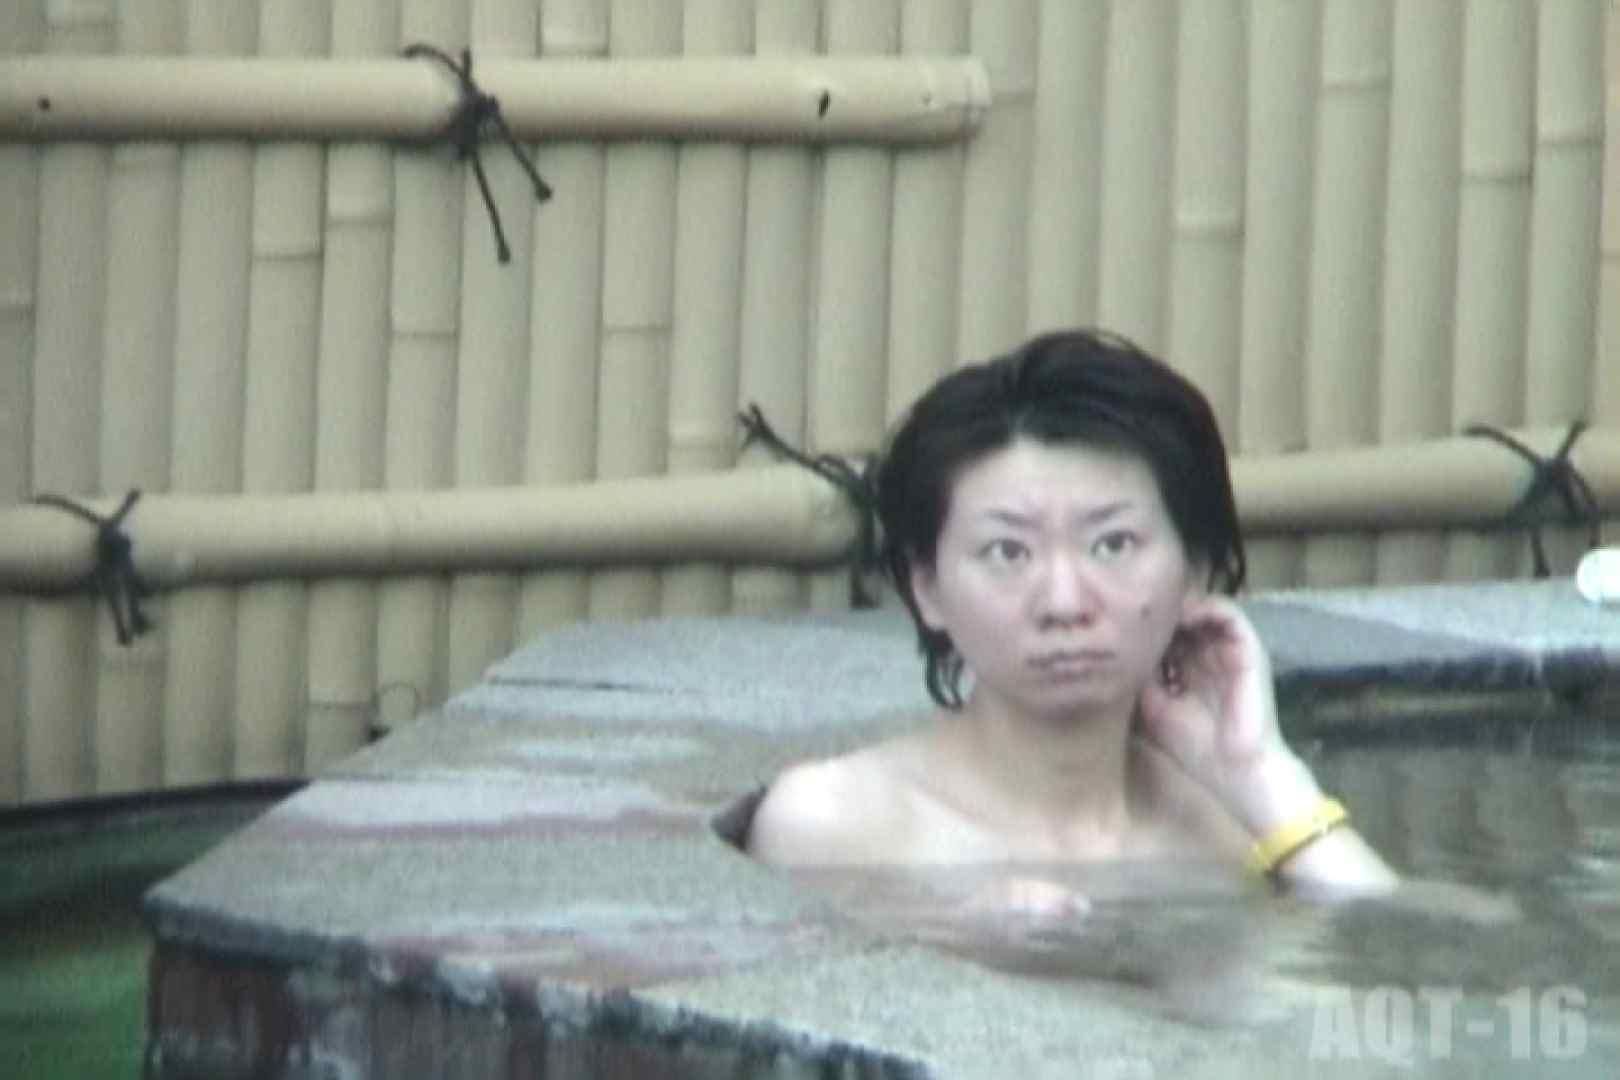 Aquaな露天風呂Vol.842 露天風呂編 | 盗撮シリーズ  82PIX 27